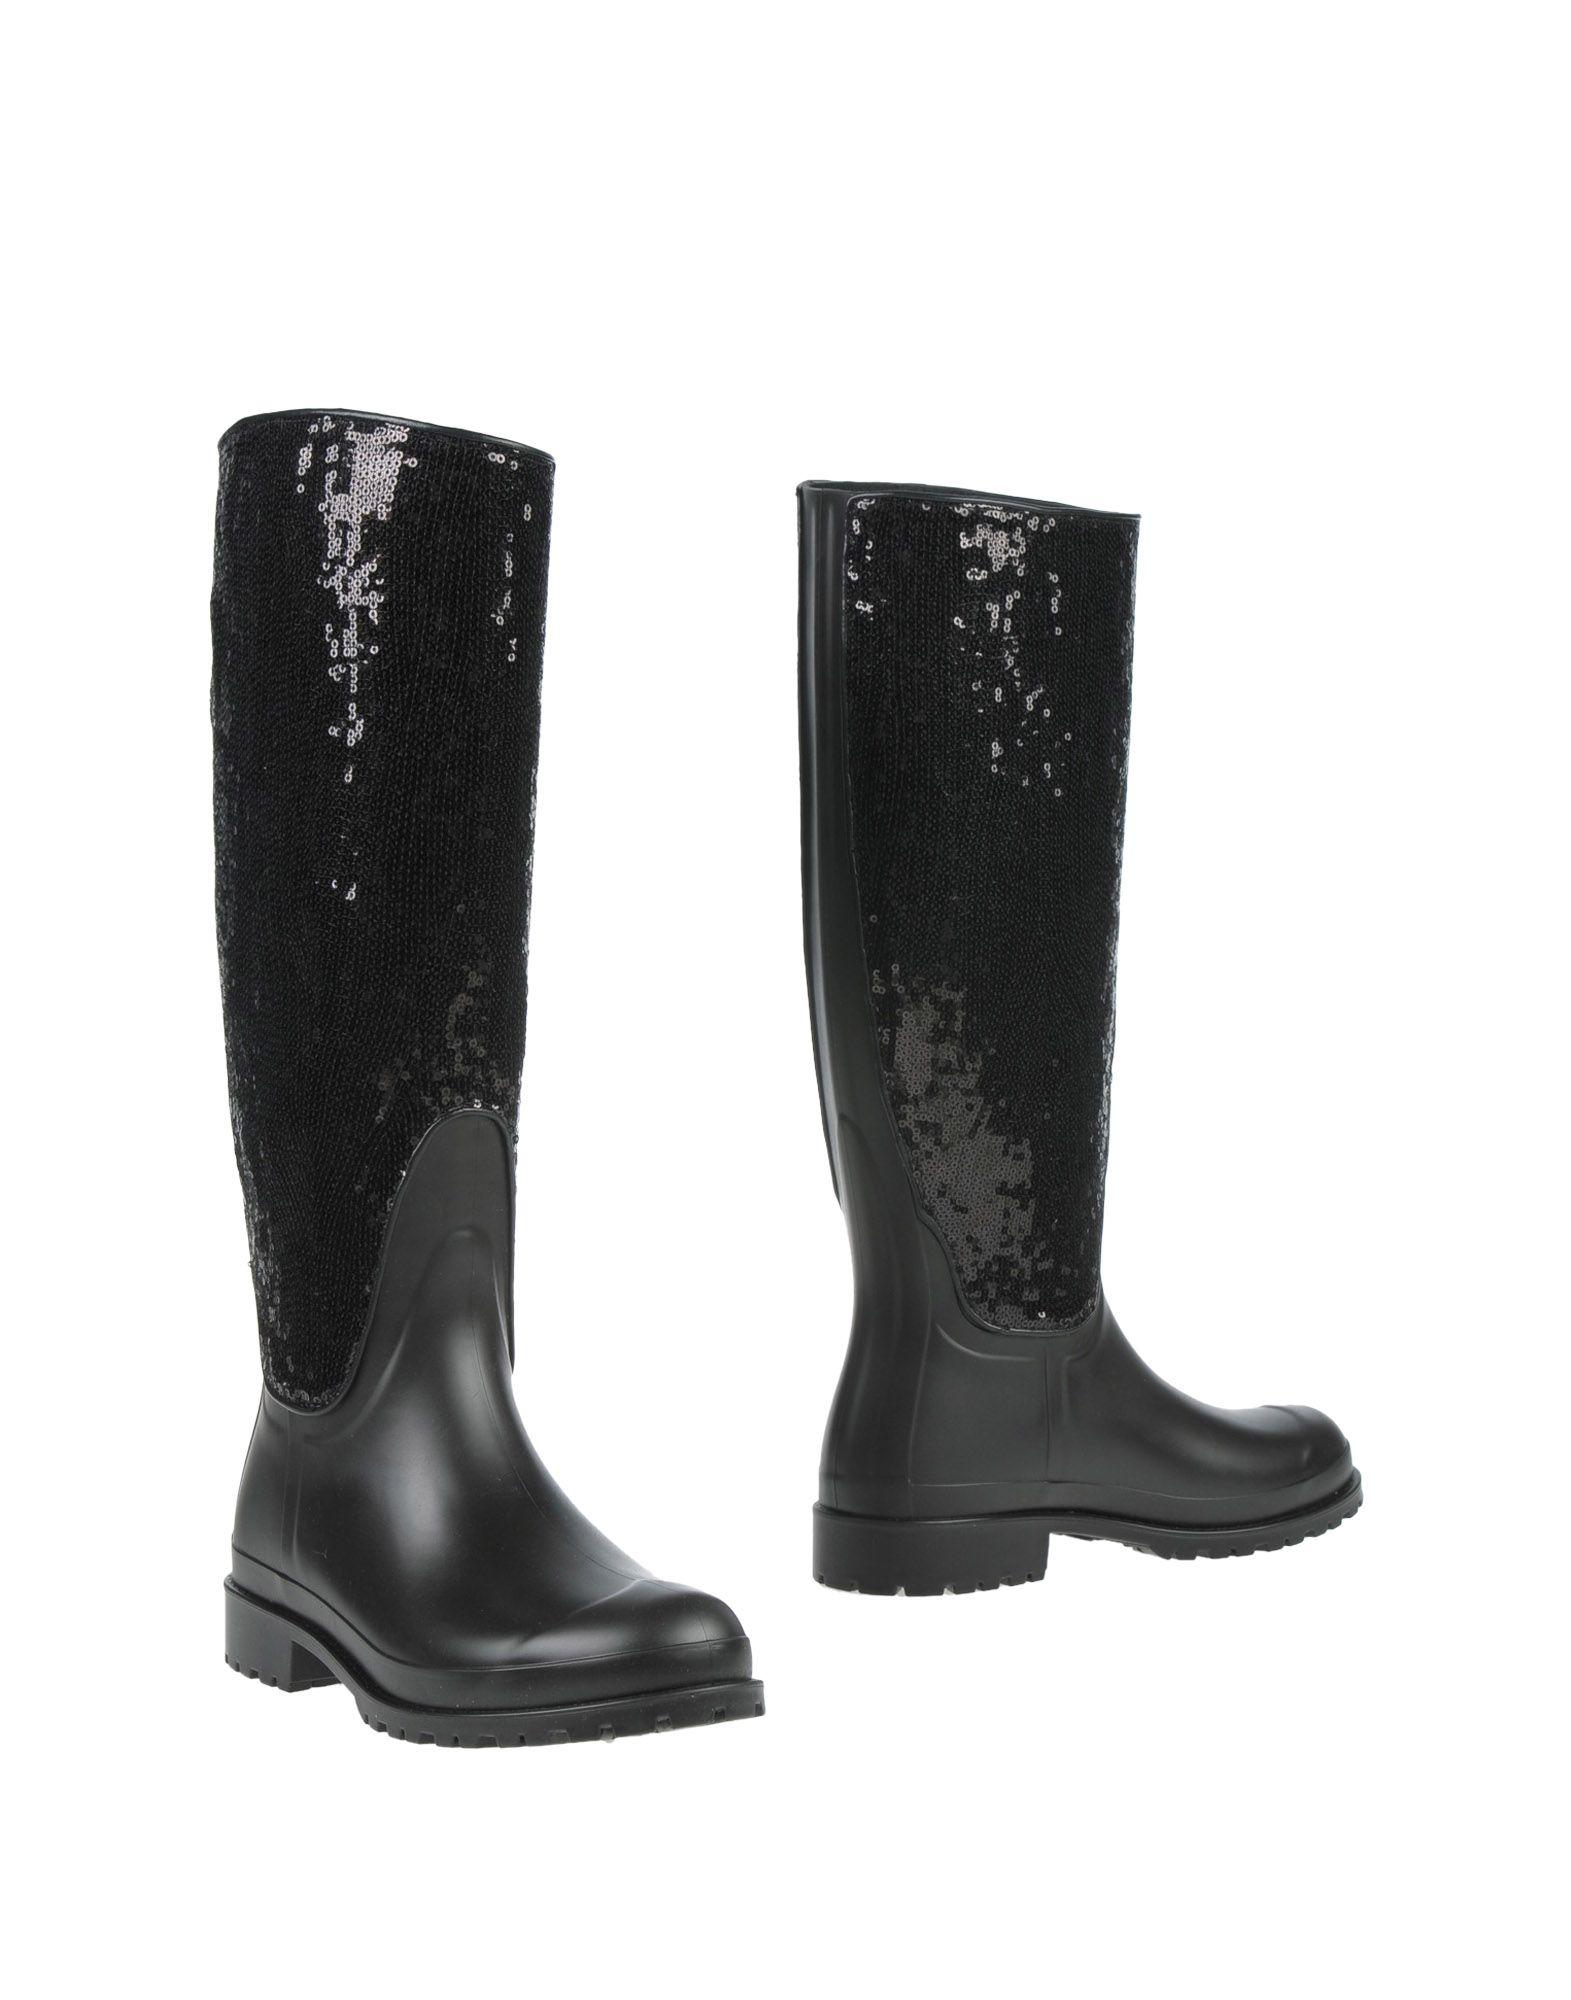 Saint Laurent Stiefel Damen  11402717HG Beliebte Schuhe